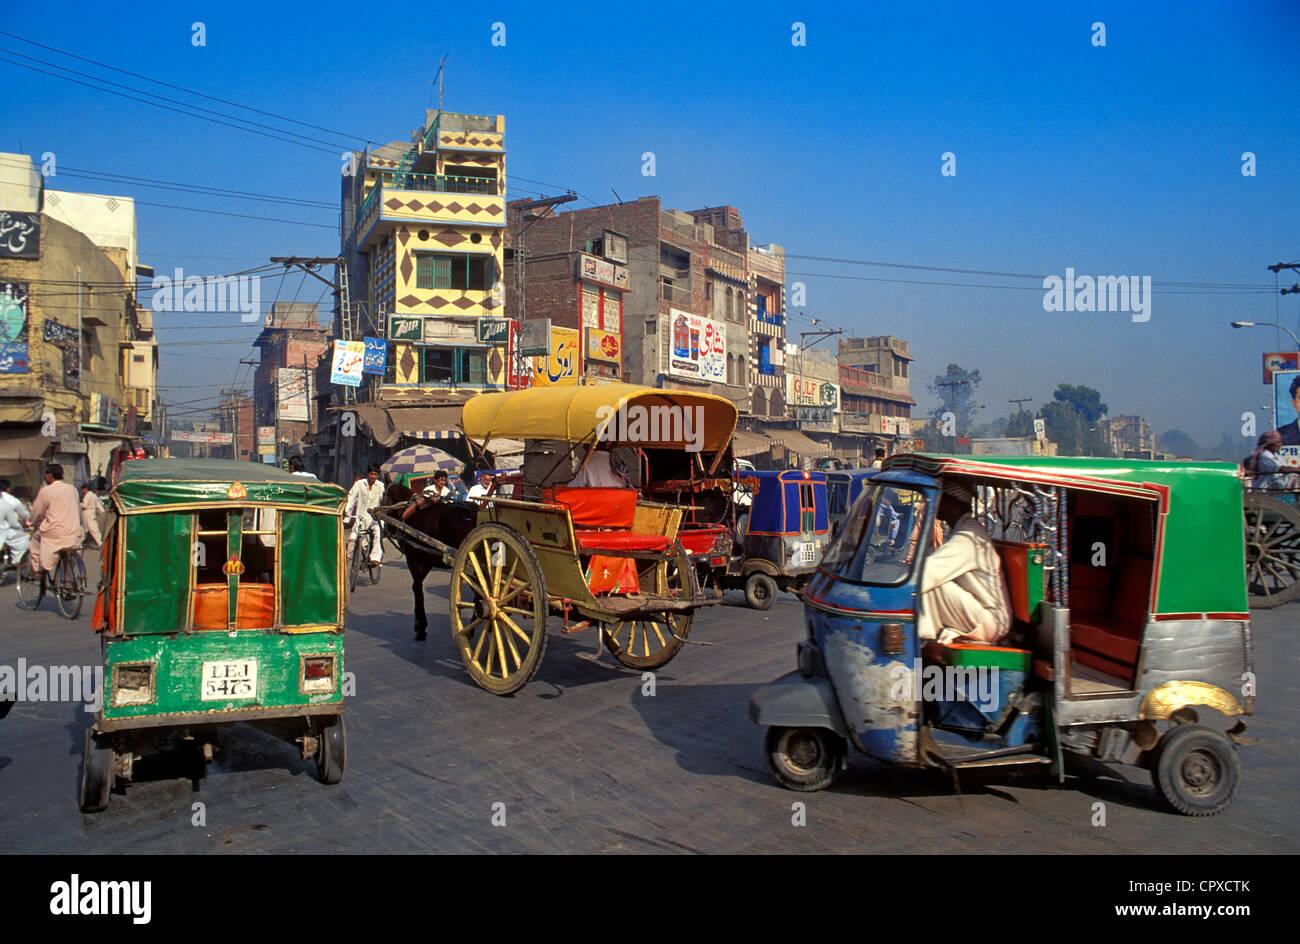 Pakistan, Lahore, street scene - Stock Image